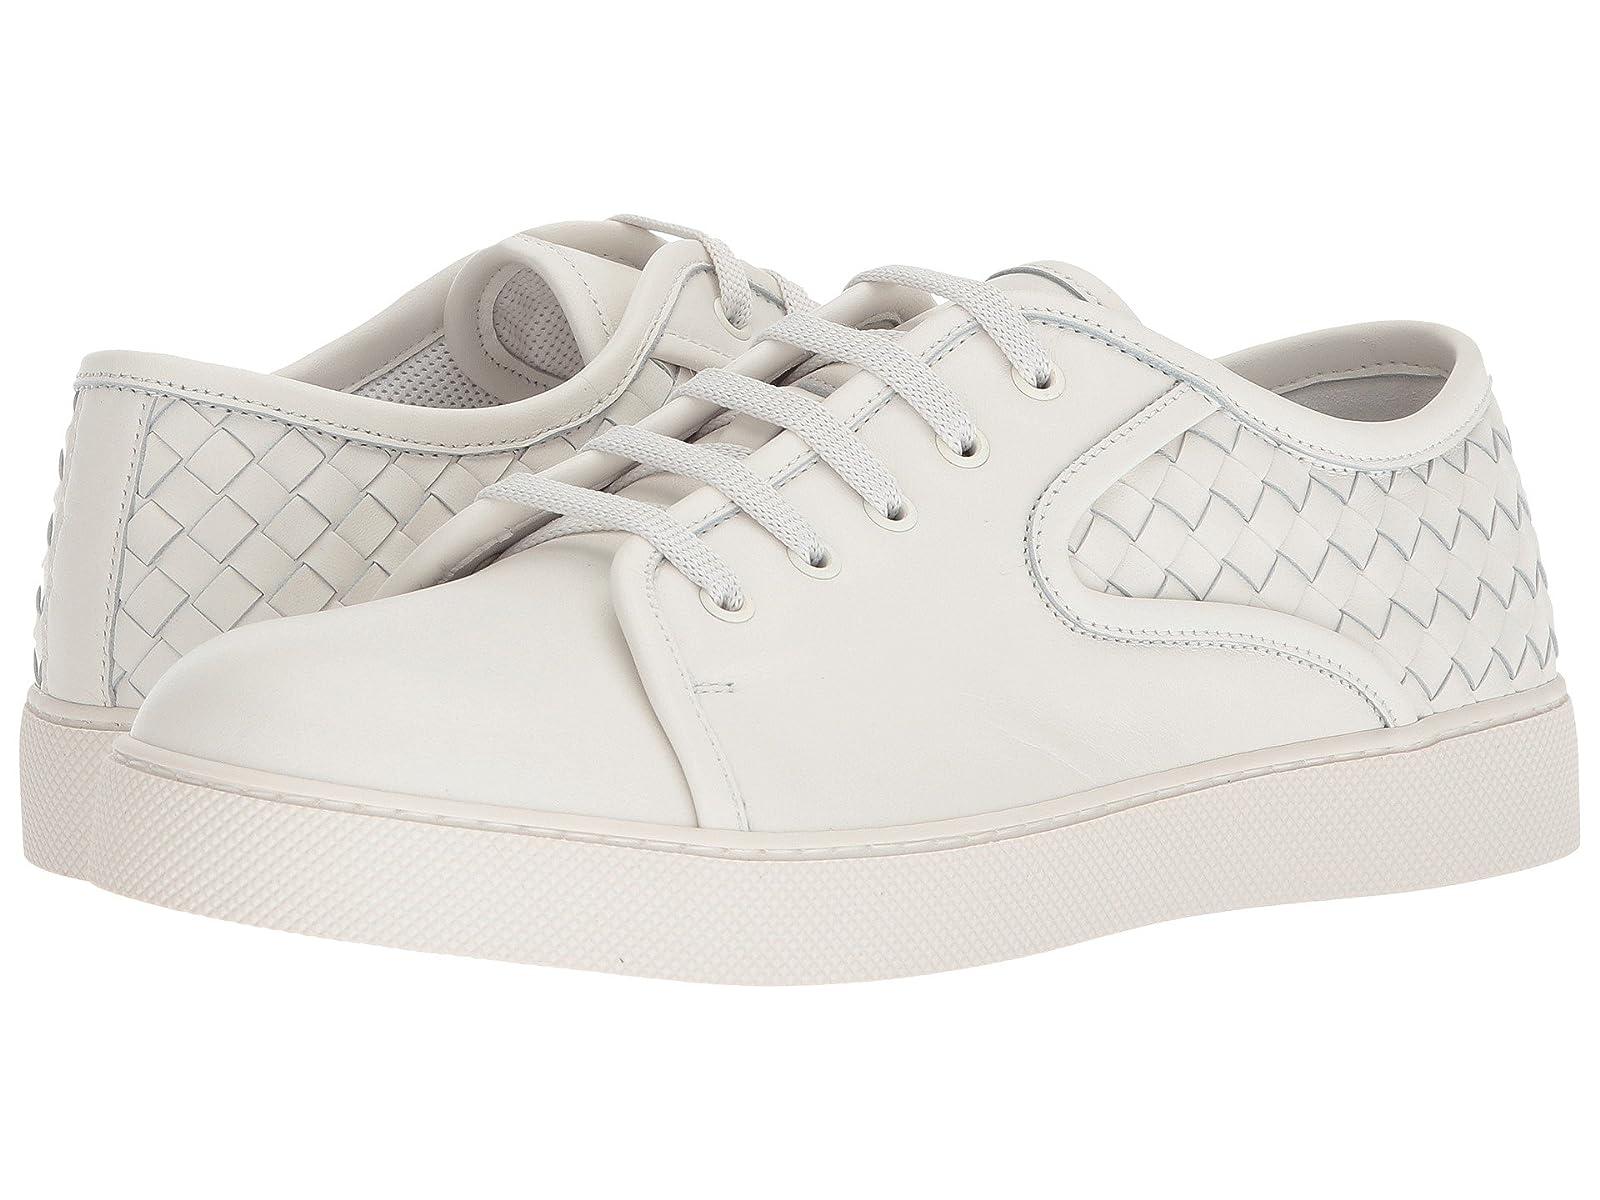 Bottega Veneta Dodger Lace-Up SneakerAtmospheric grades have affordable shoes